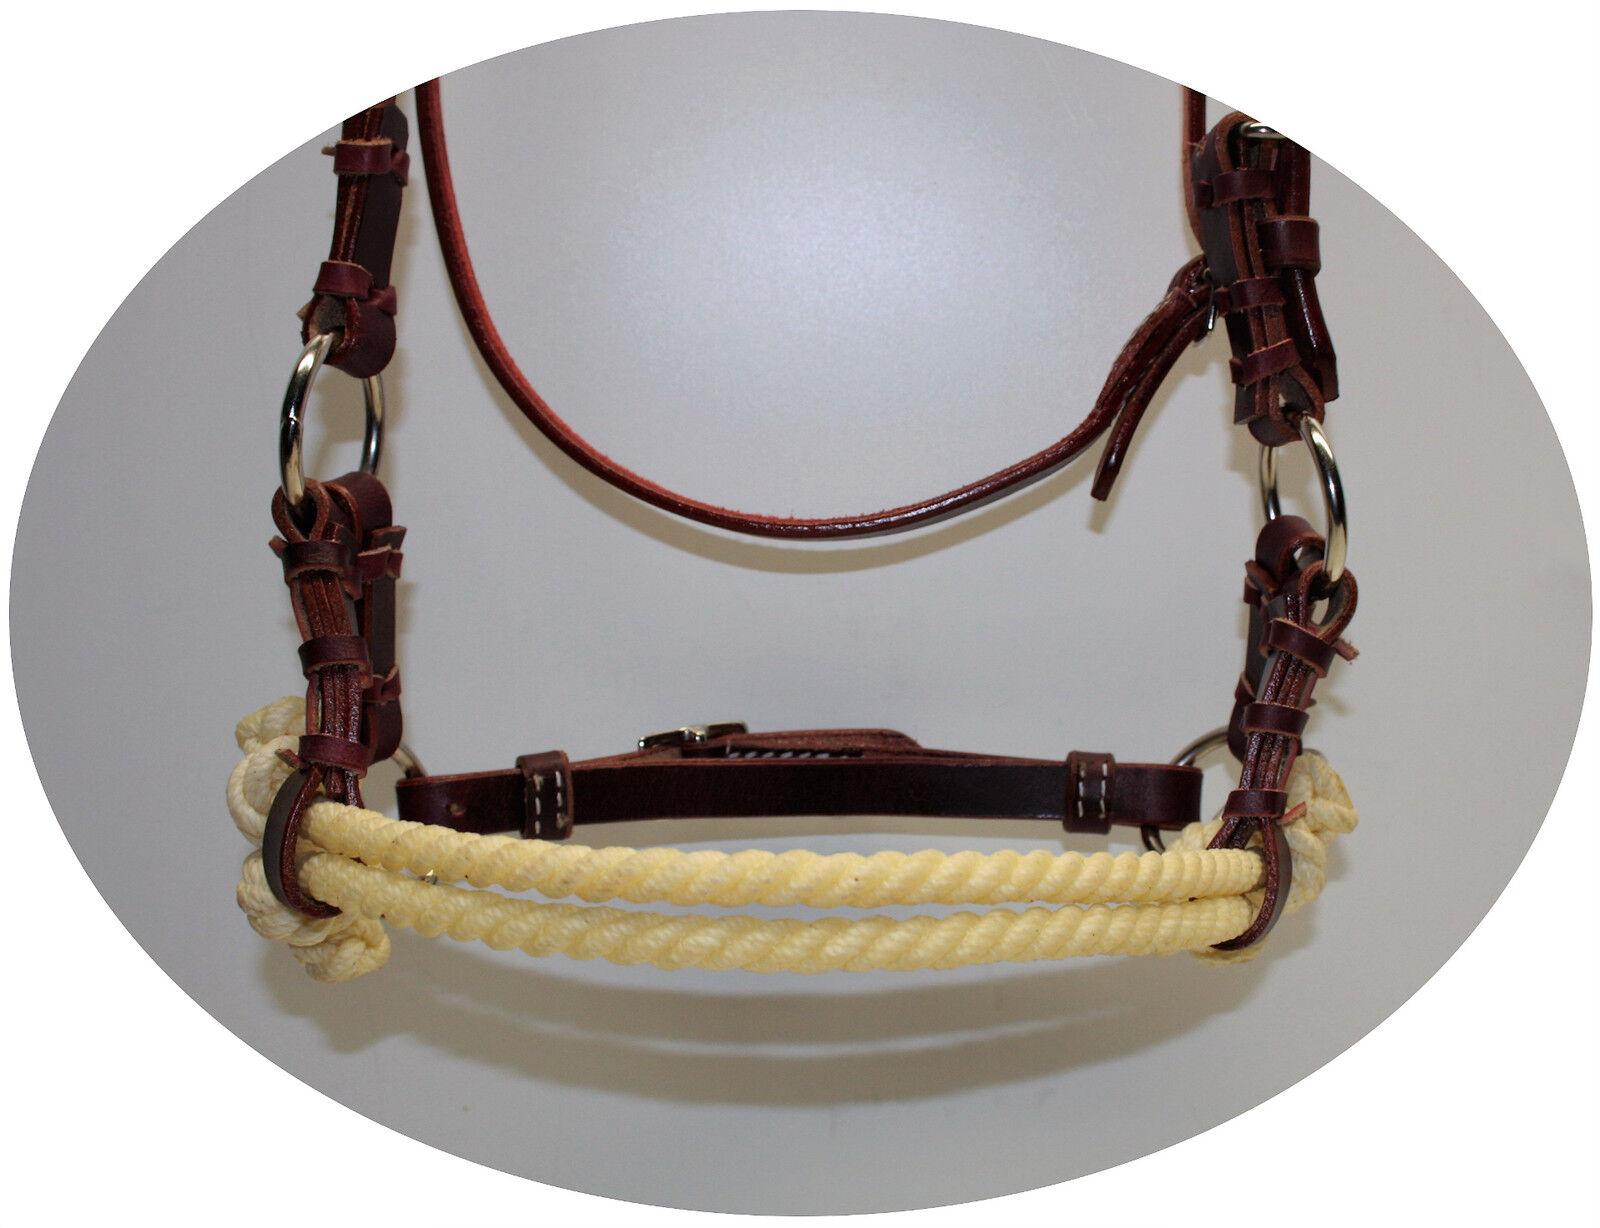 Sidepull harnessleder Double Double Double rope noseband de latigo cuero tamaño full 2bd913